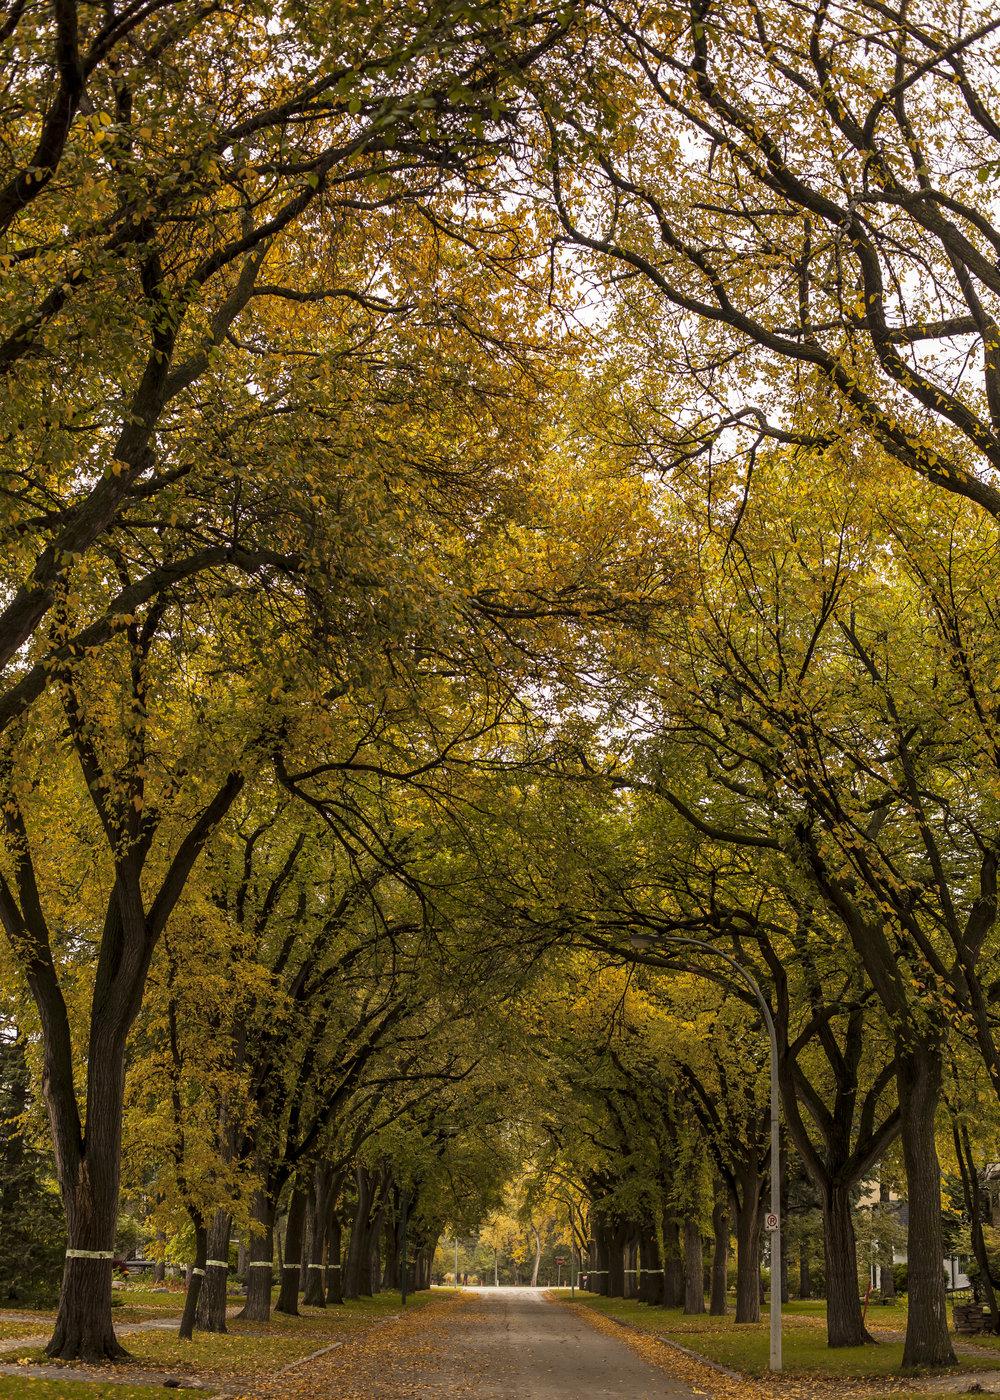 A classic sight in Winnipeg. Elm trees lining a street near Assiniboine Park.